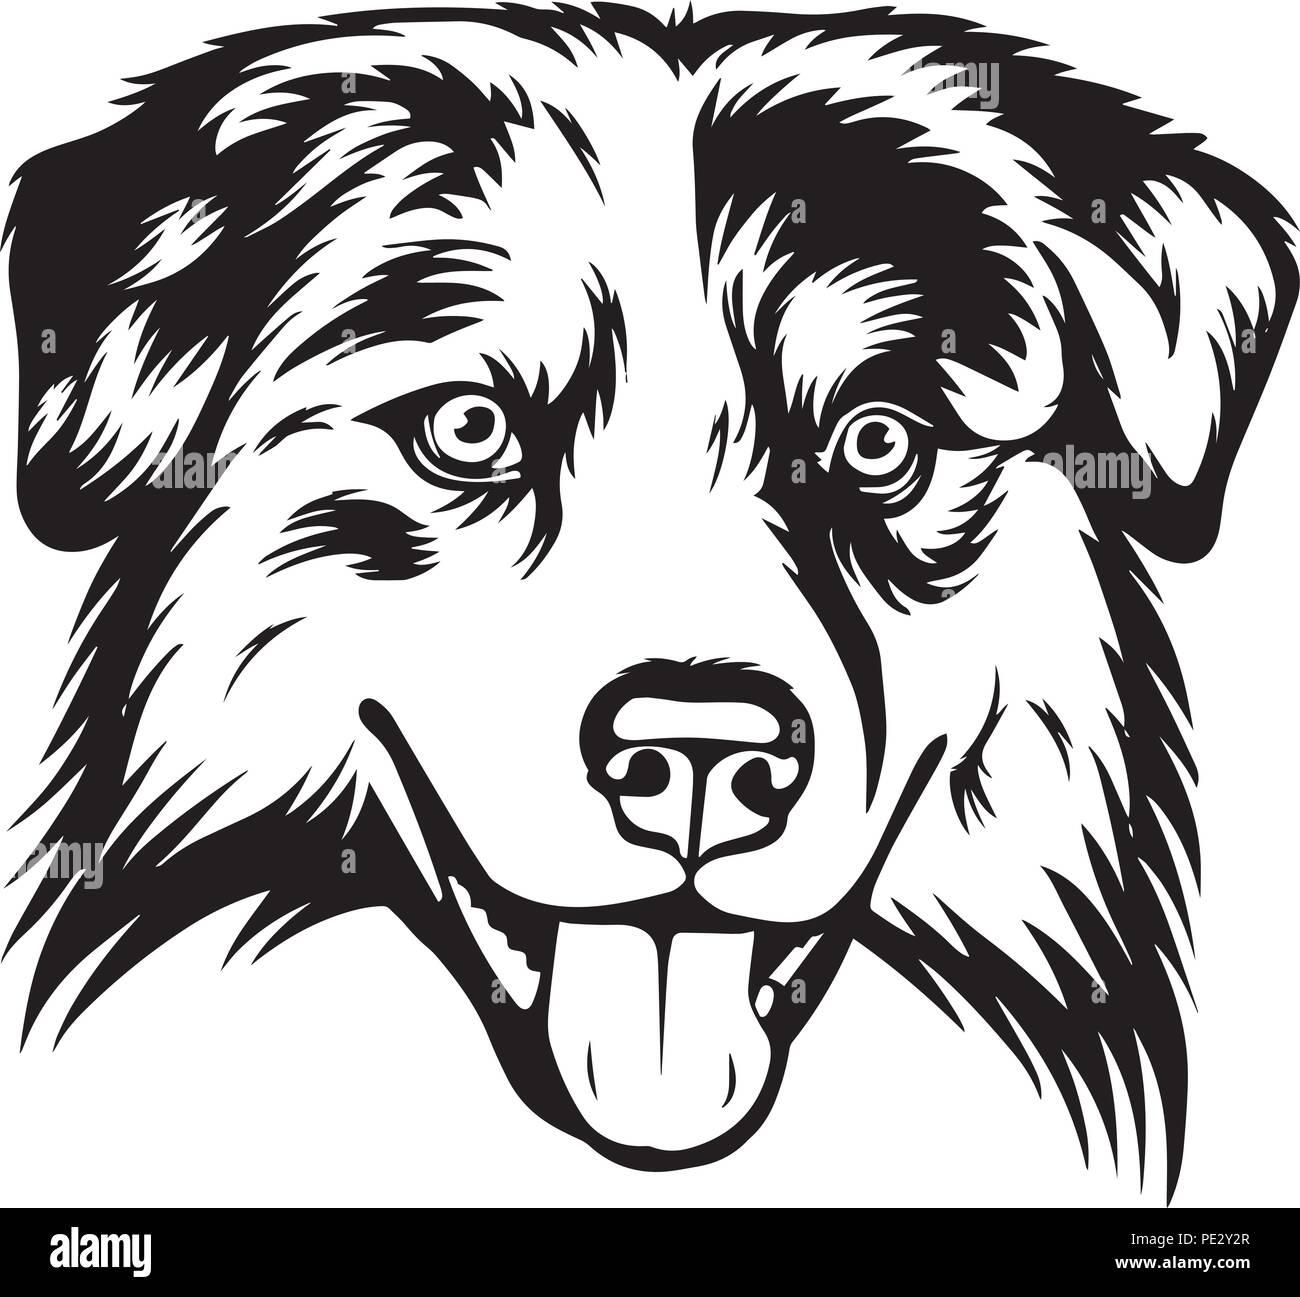 Australian Shepherd Dog Breed Pet Puppy Isolated Head Face Stock Vector